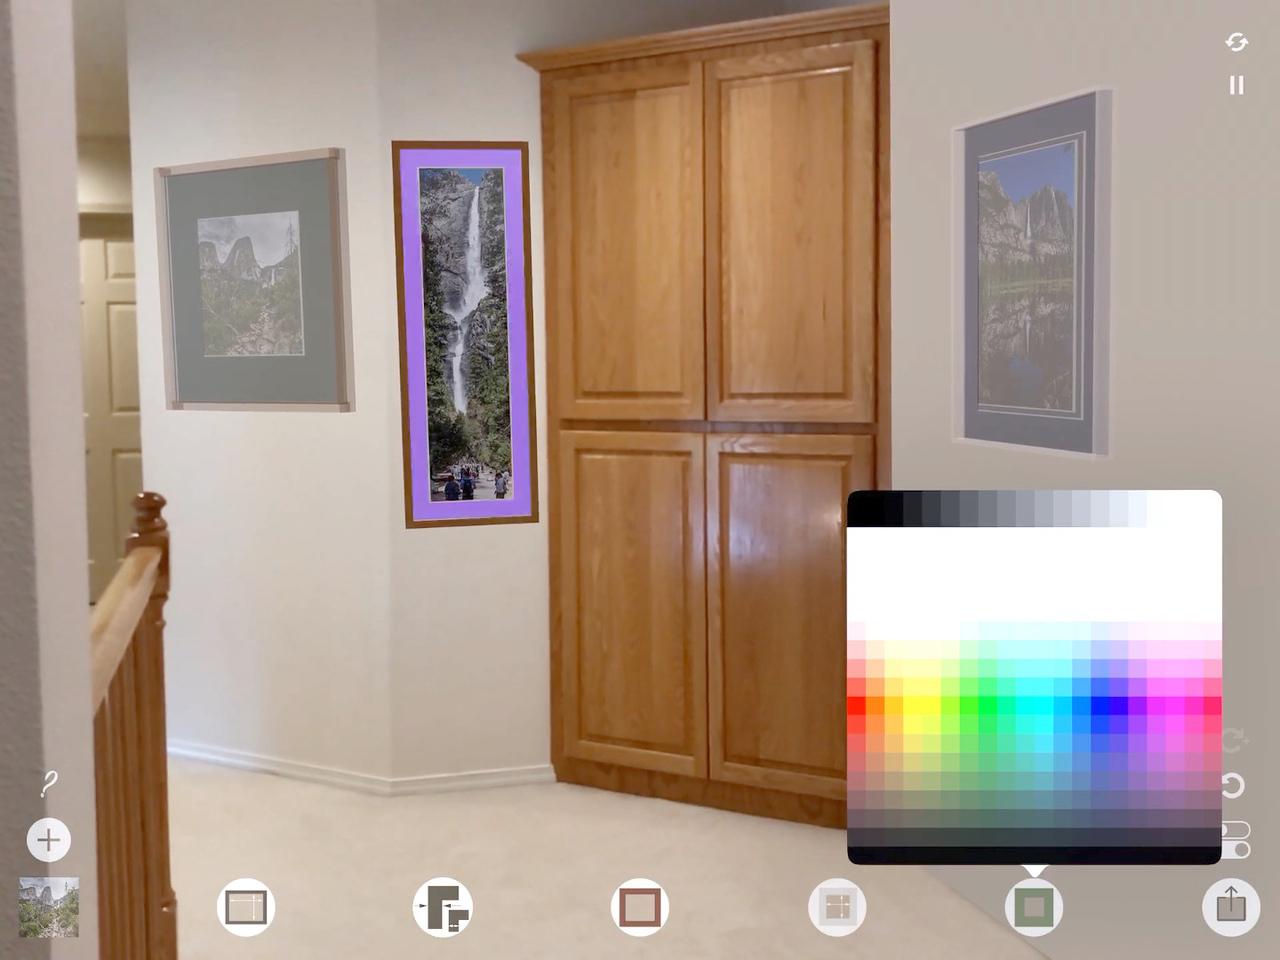 v3.0 Customize mat & frame colors